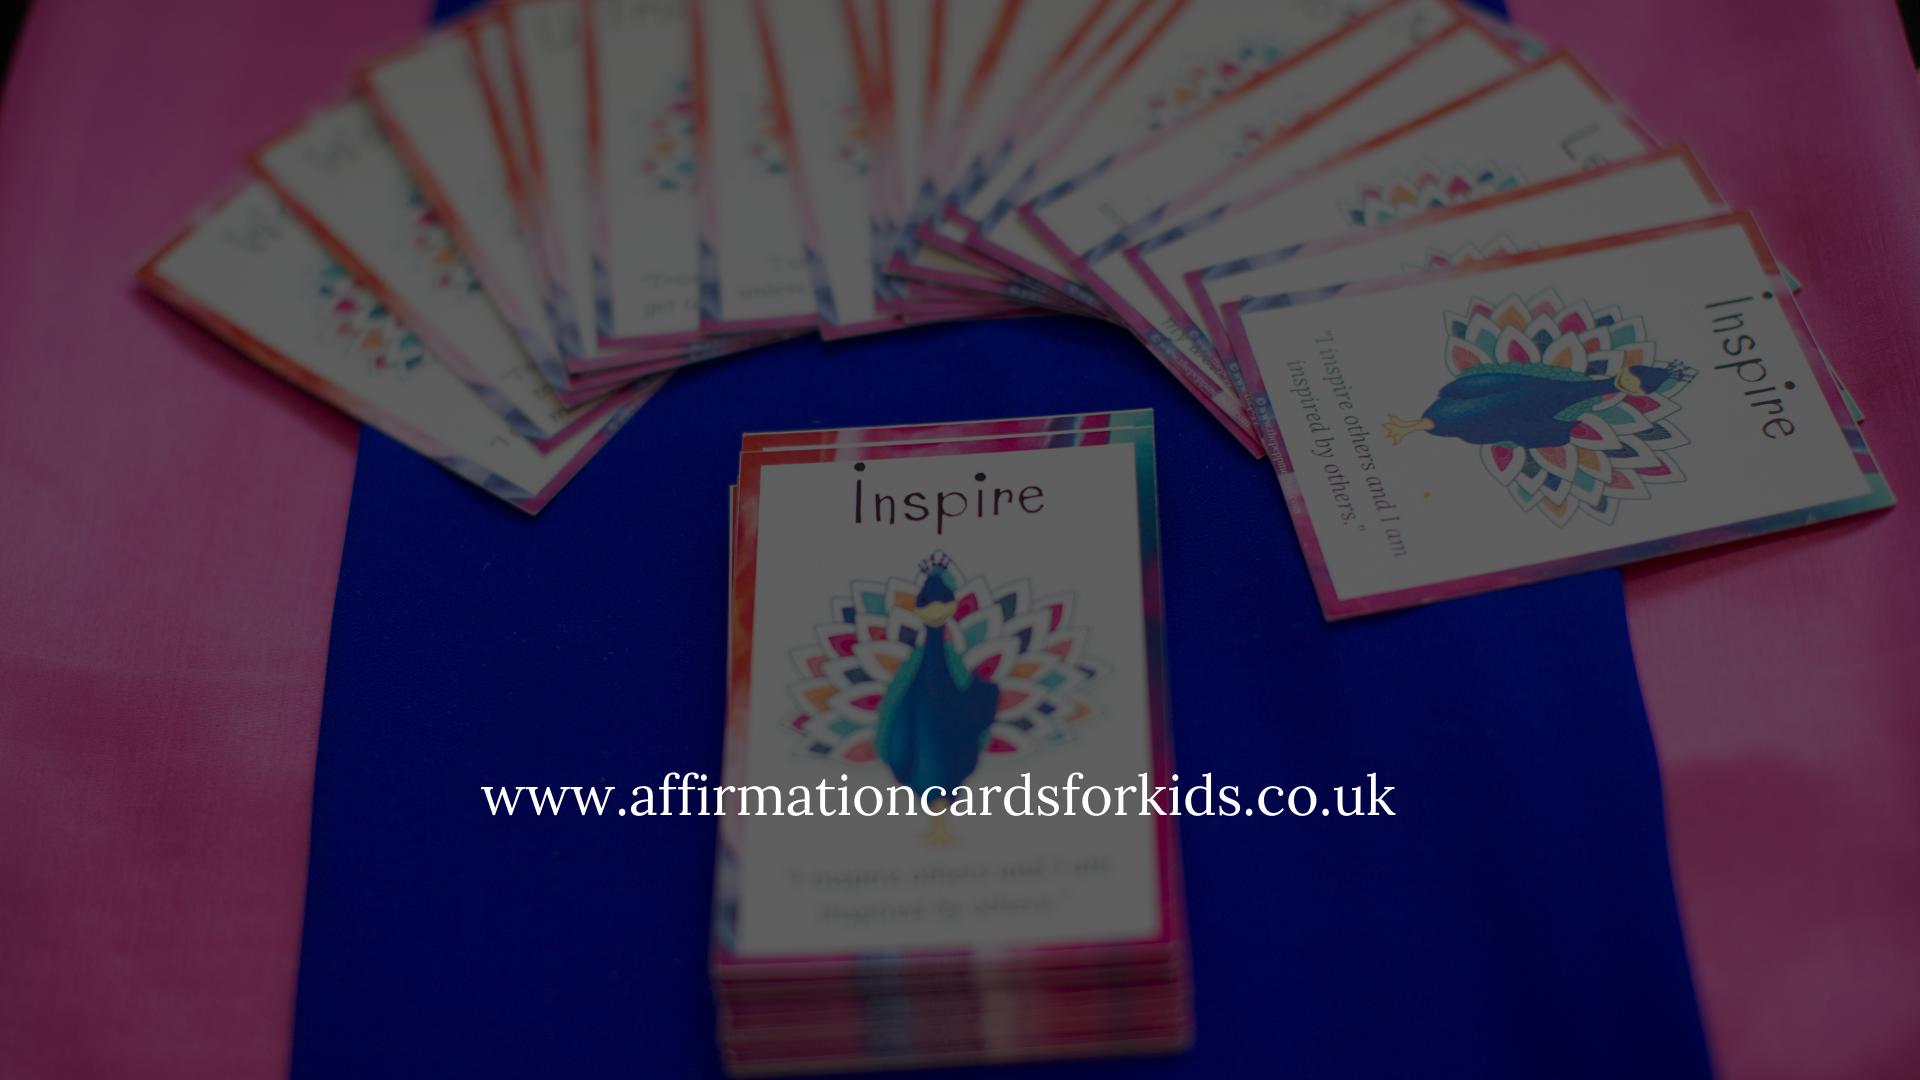 Affirmation Cards For Kids - Jennifer Barnfield - The PEPP Method